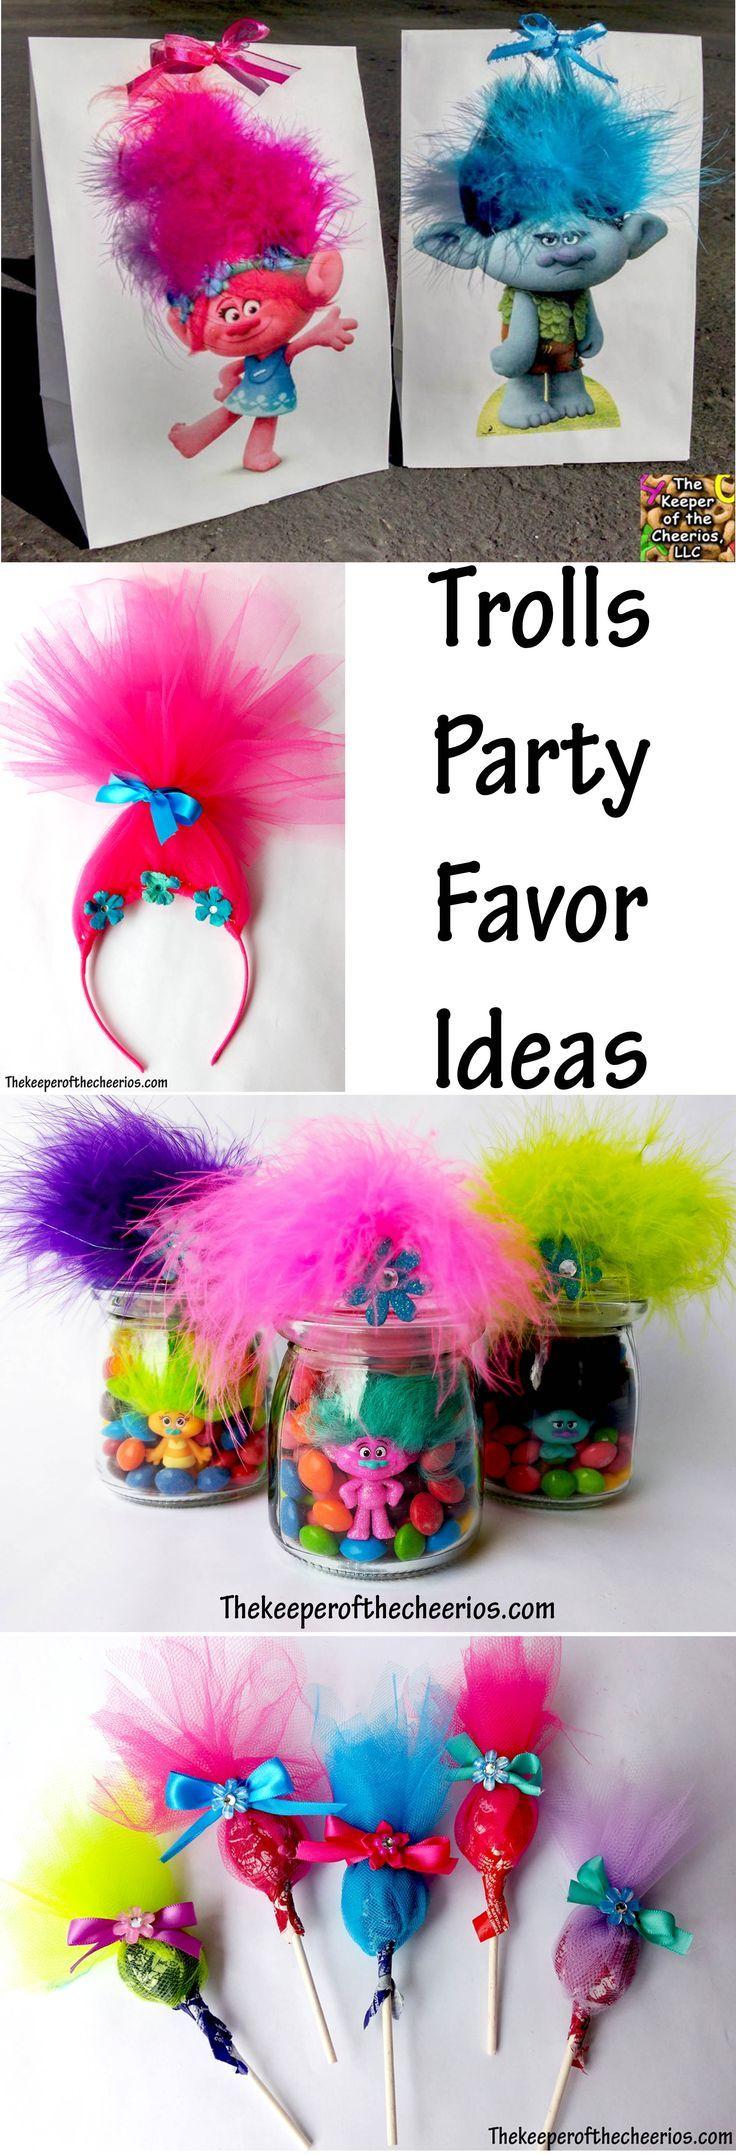 Tiny trolls party giveaways